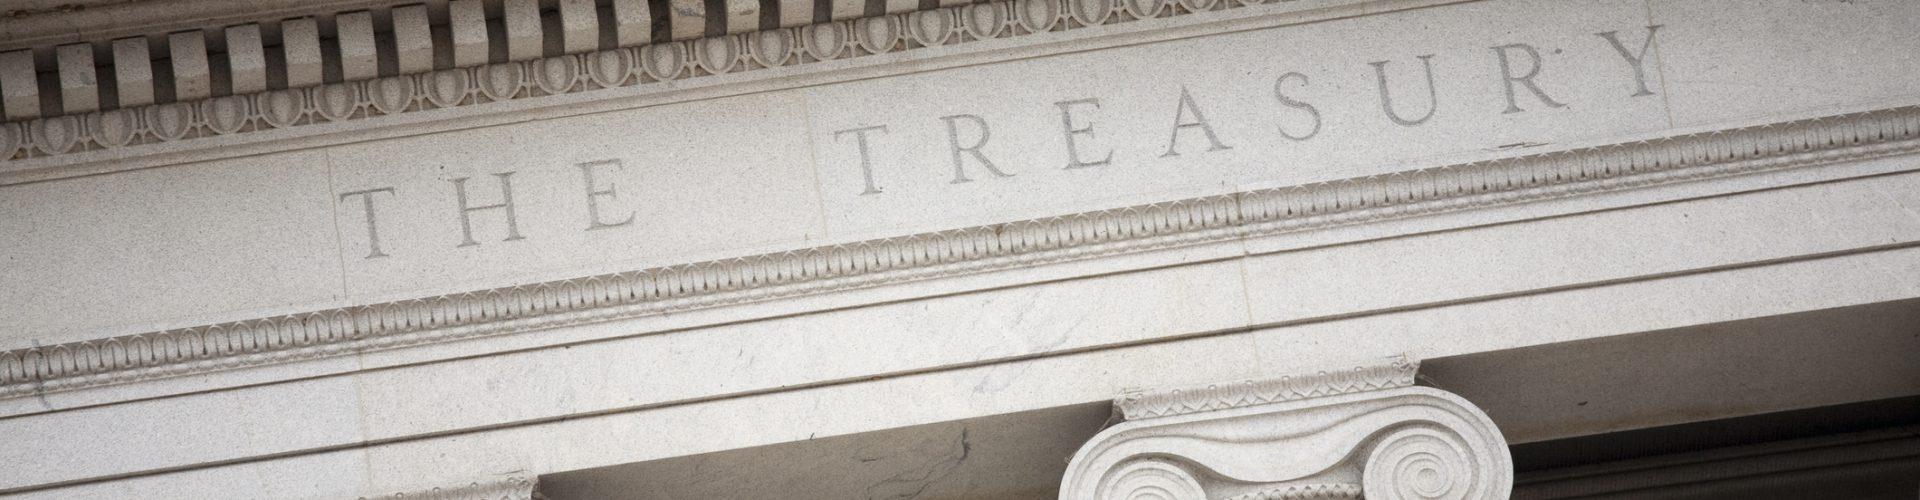 US Treasury Building. Washington DC. Check out my